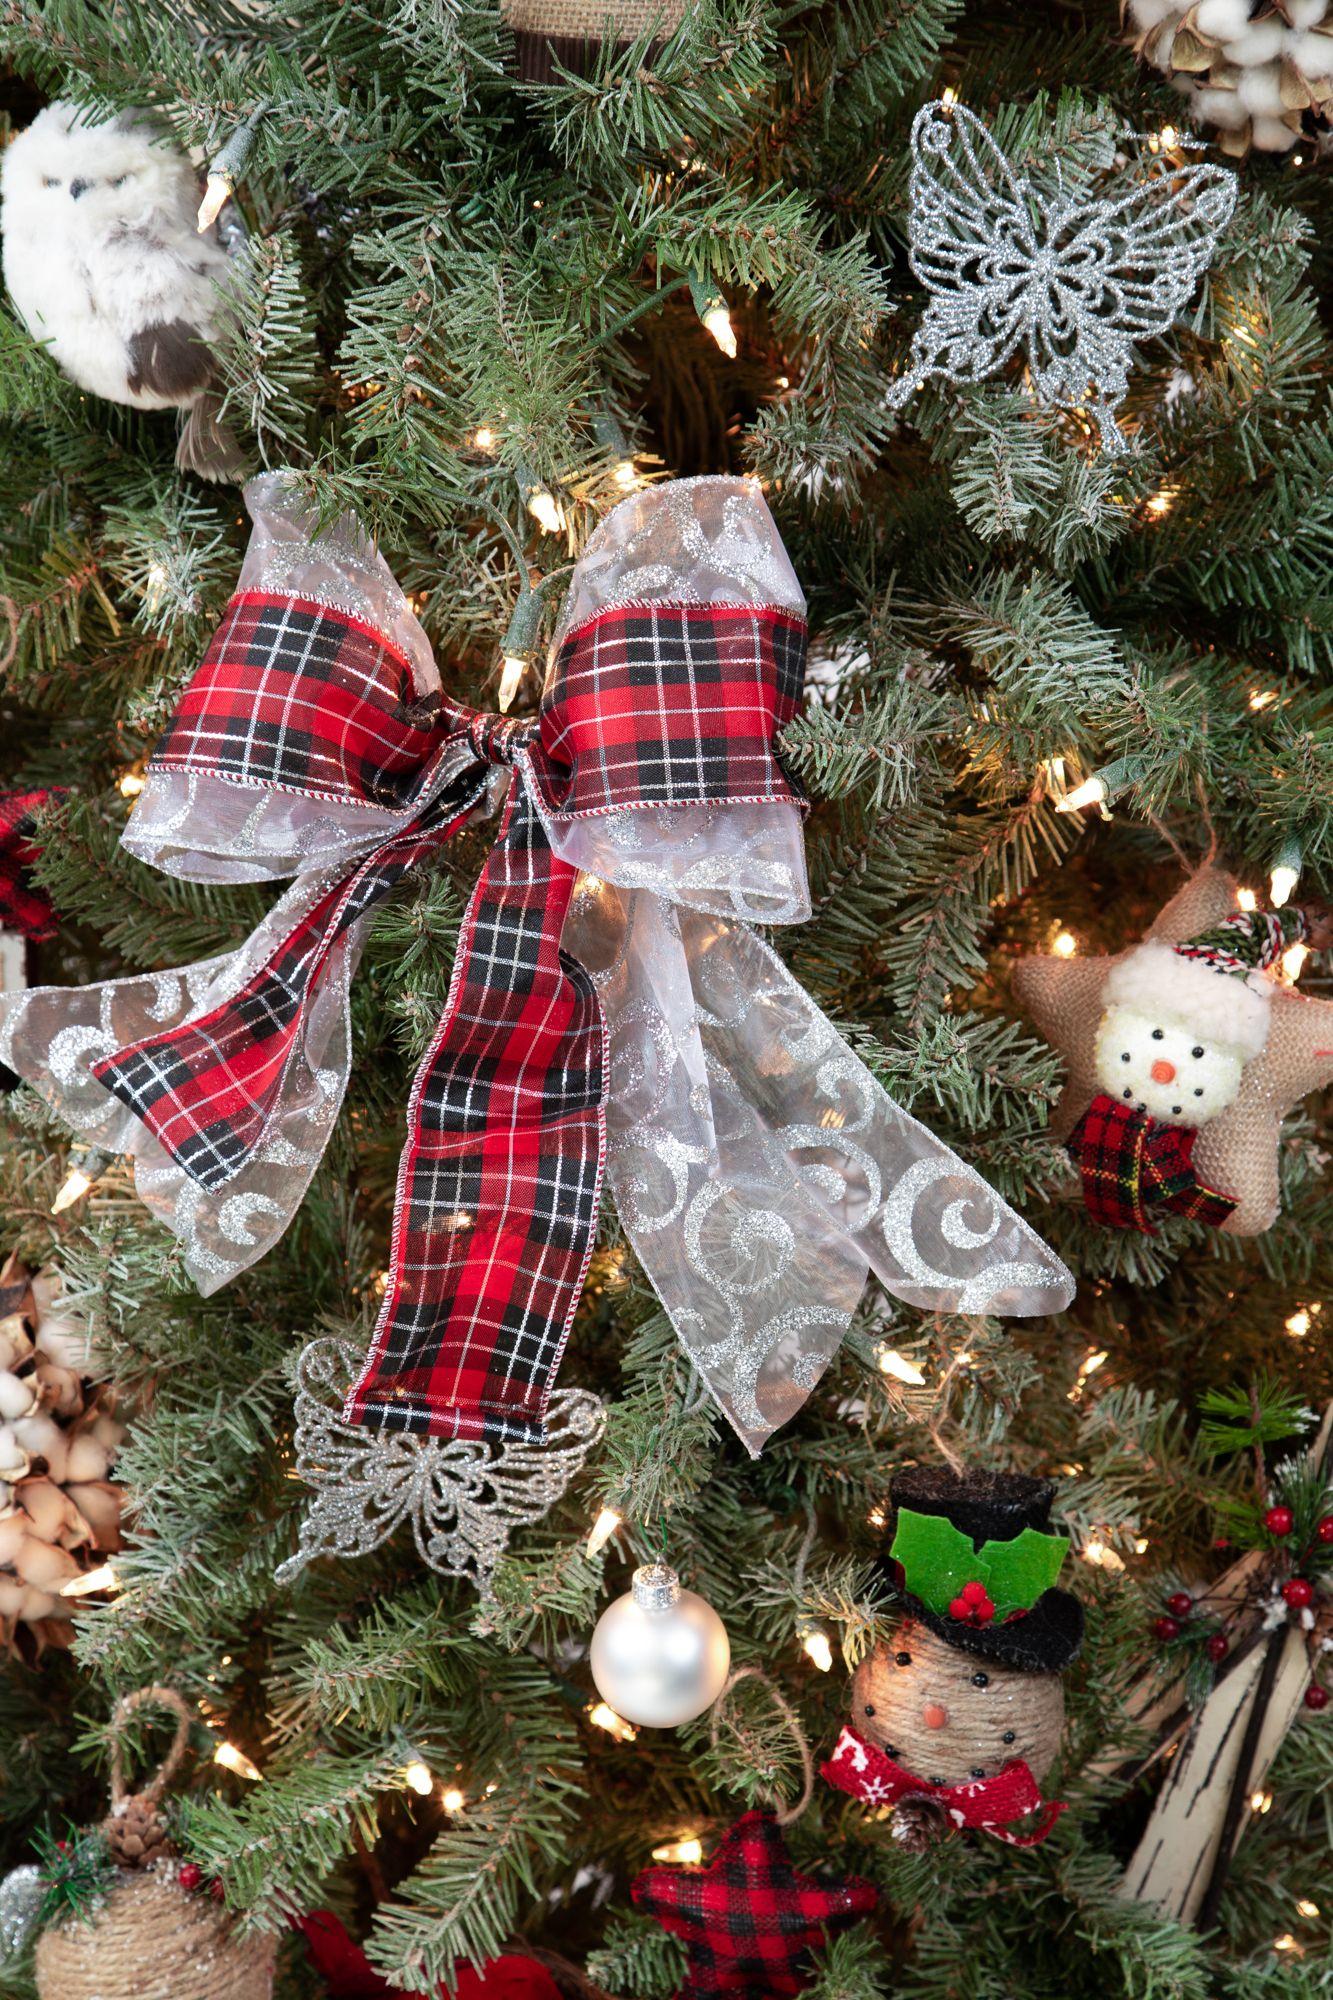 Buffalo Plaid Bows Are The Hottest Trend This Christmas Season Shop Treelf Fargo Christmas Tree Ornament Kits Christmas Tree Design Christmas Tree Ornaments